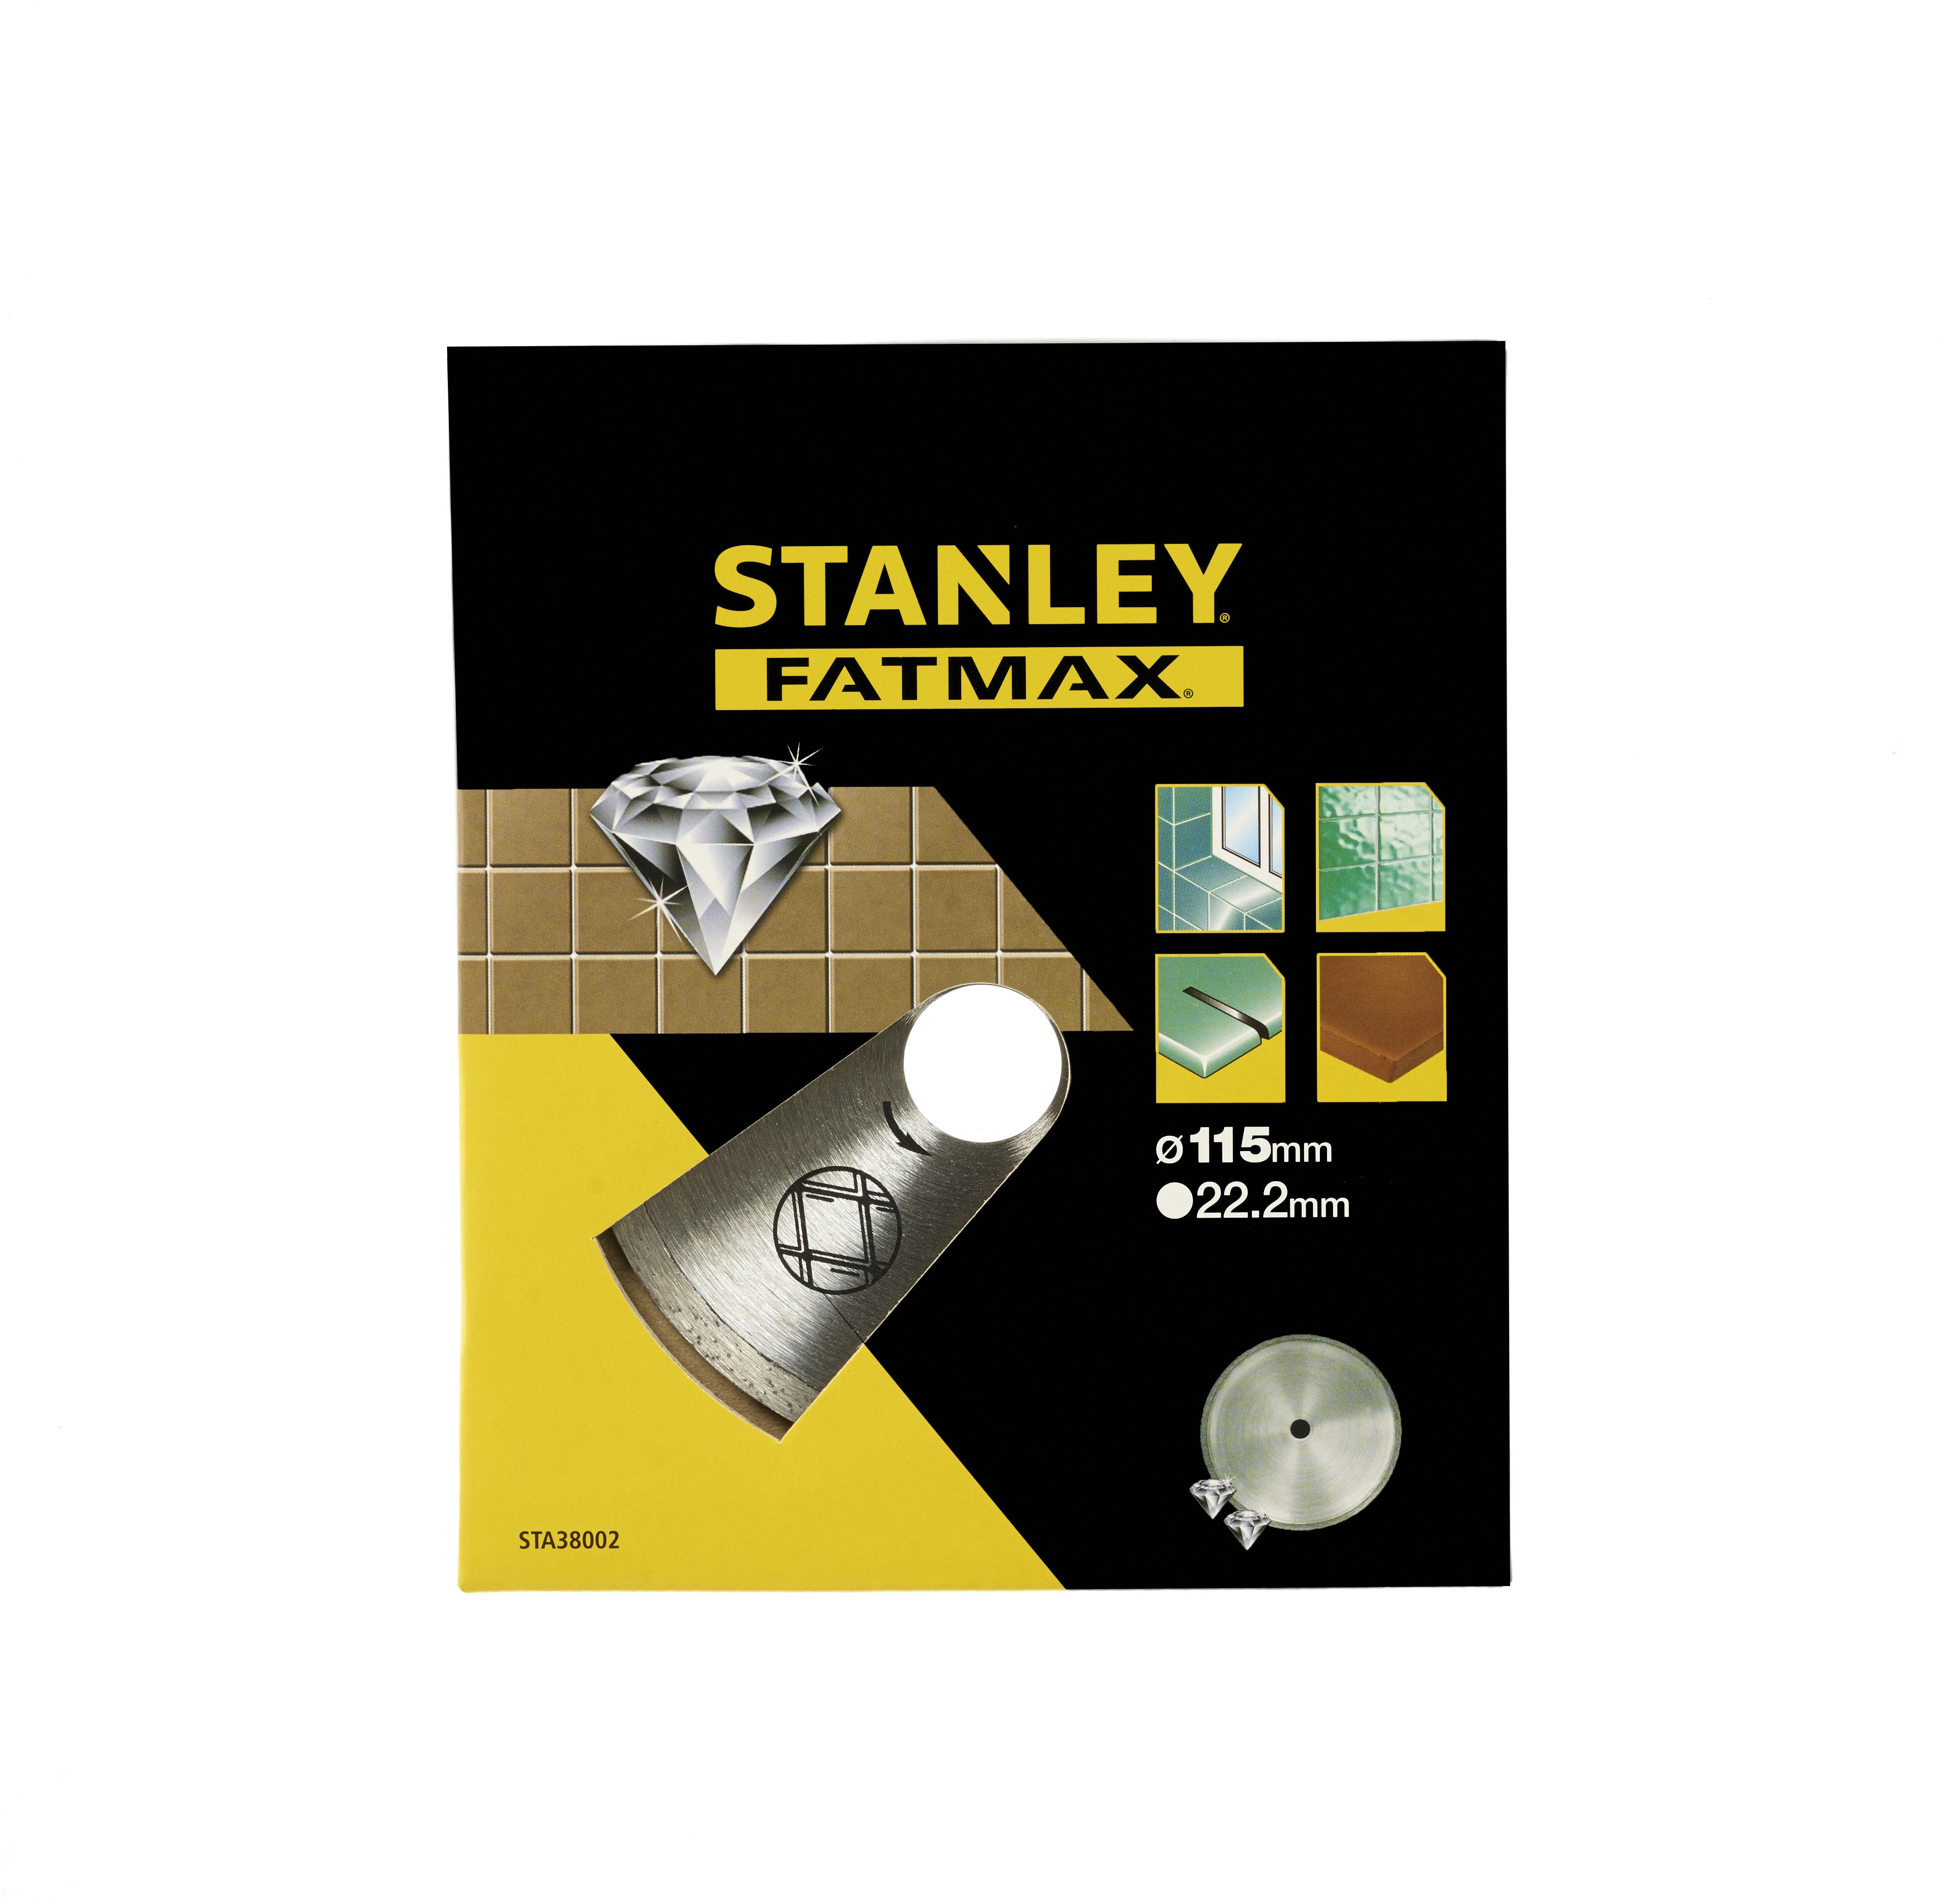 Круг алмазный Stanley Sta38002-xj permanent roland xj 640 xj 740 eco solvent chips 6pcs set cmyklclm printer parts